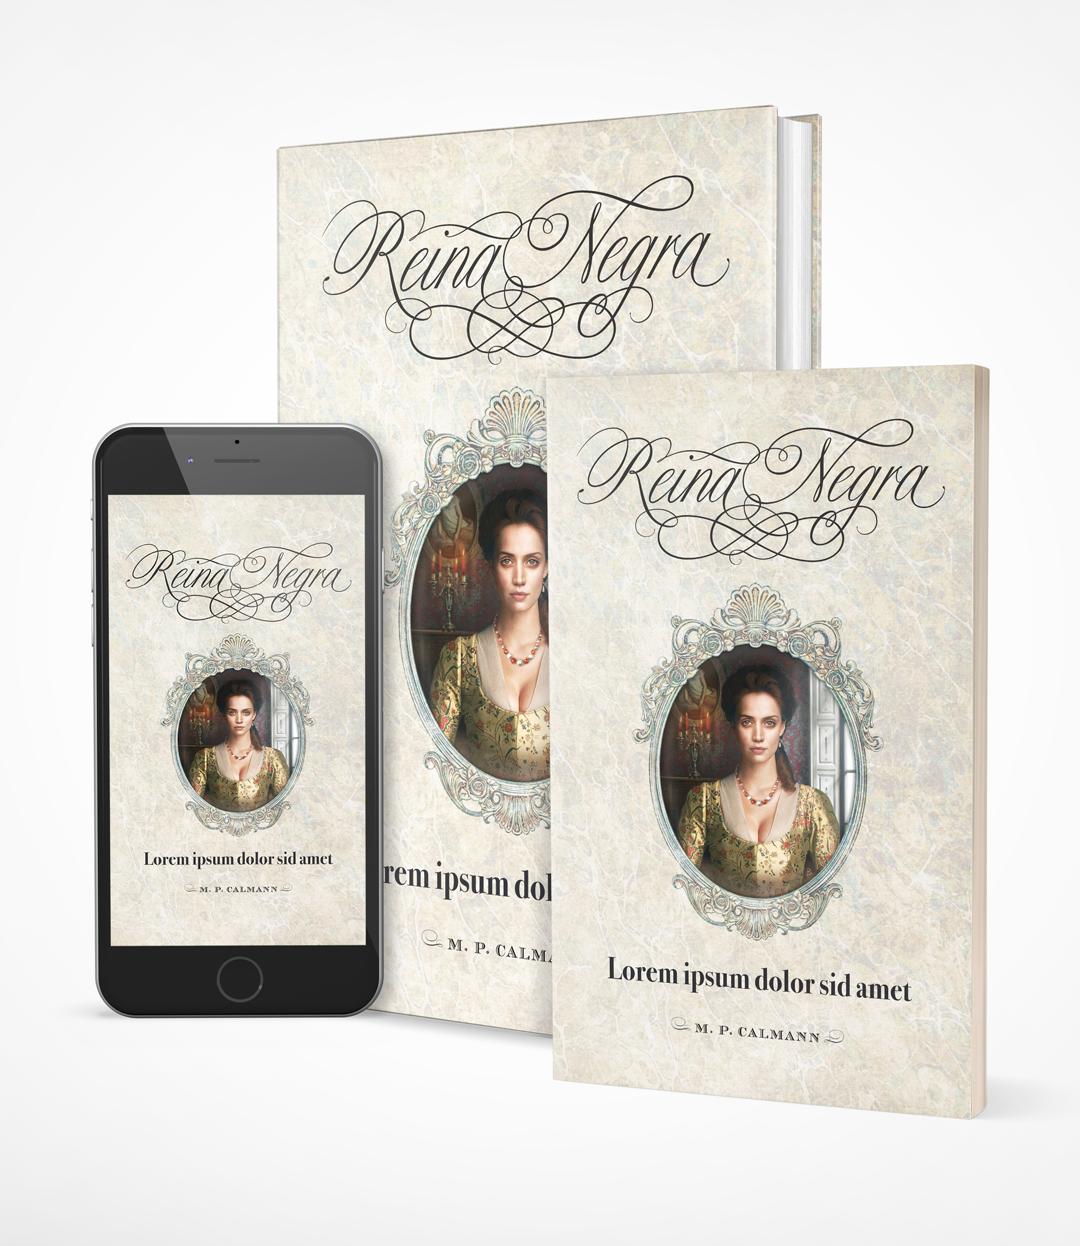 Reina Negra - Saga de novela romántica histórica - Libro 1